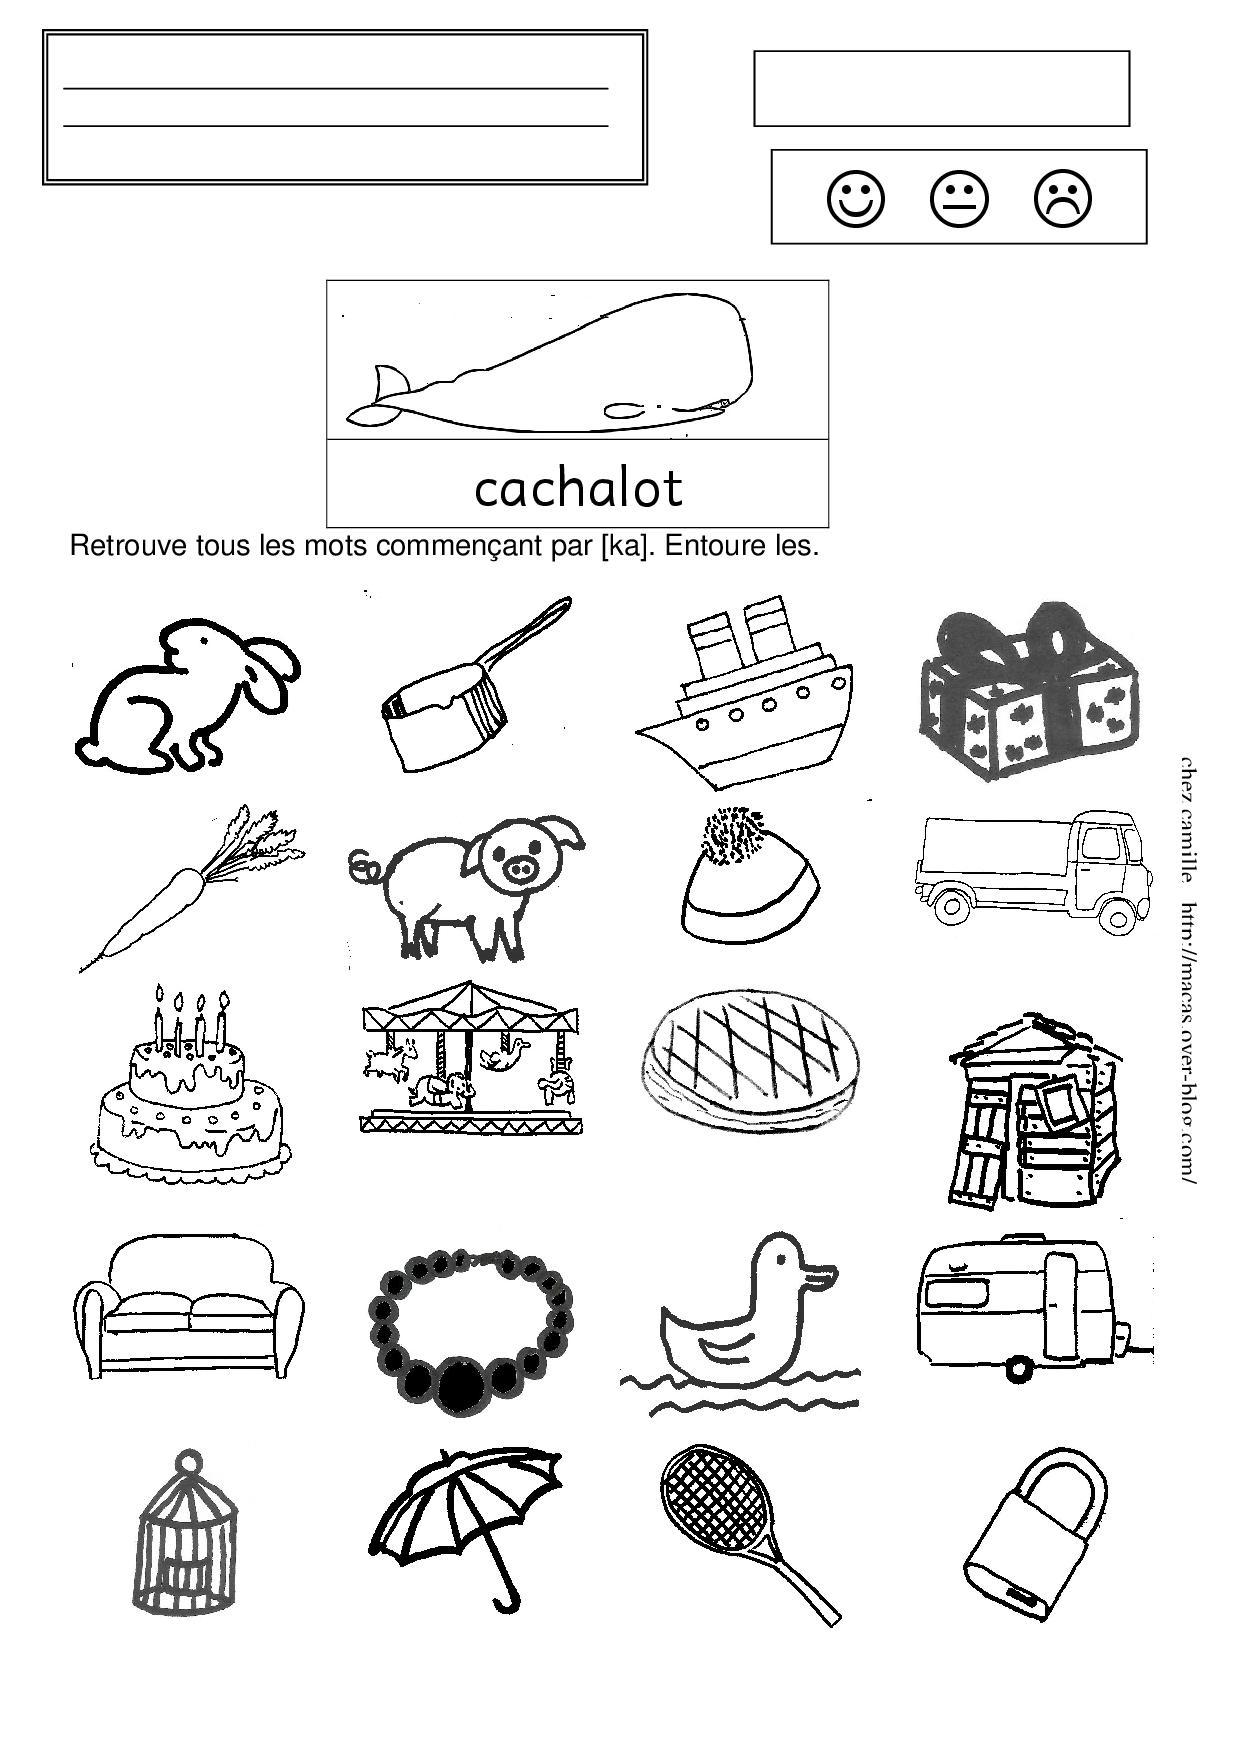 Mot Commencant Par Ka Scrabble – Gamboahinestrosa